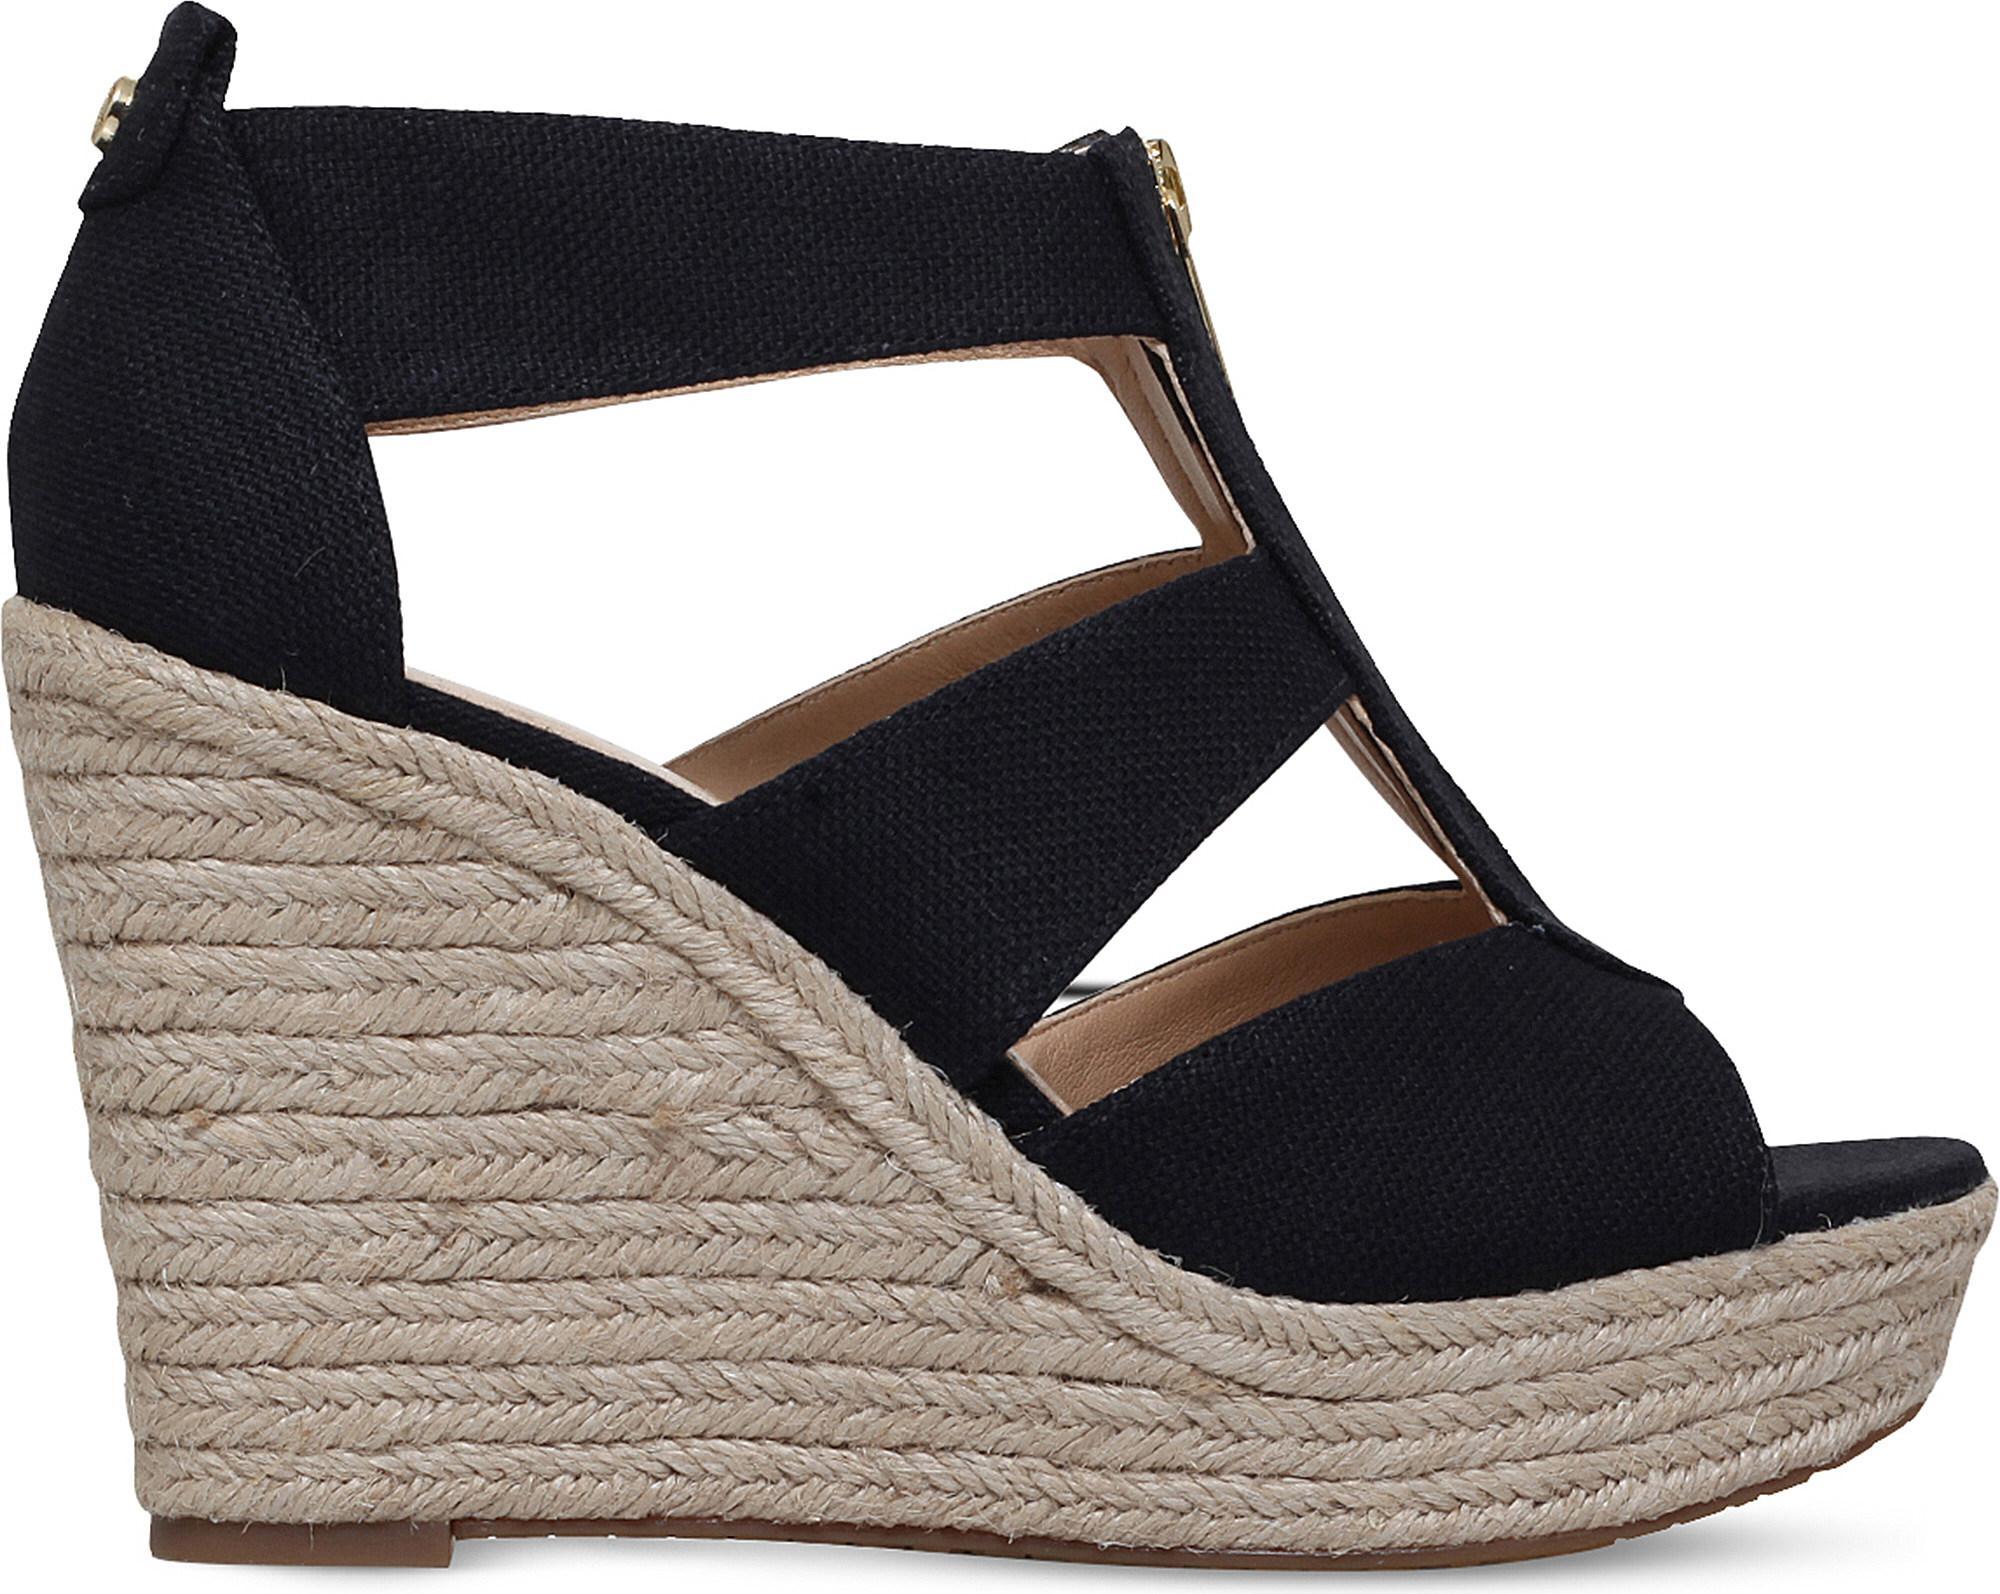 4c5df1e34341 Lyst - Michael Michael Kors Damita Espadrille Wedge Sandals in Black